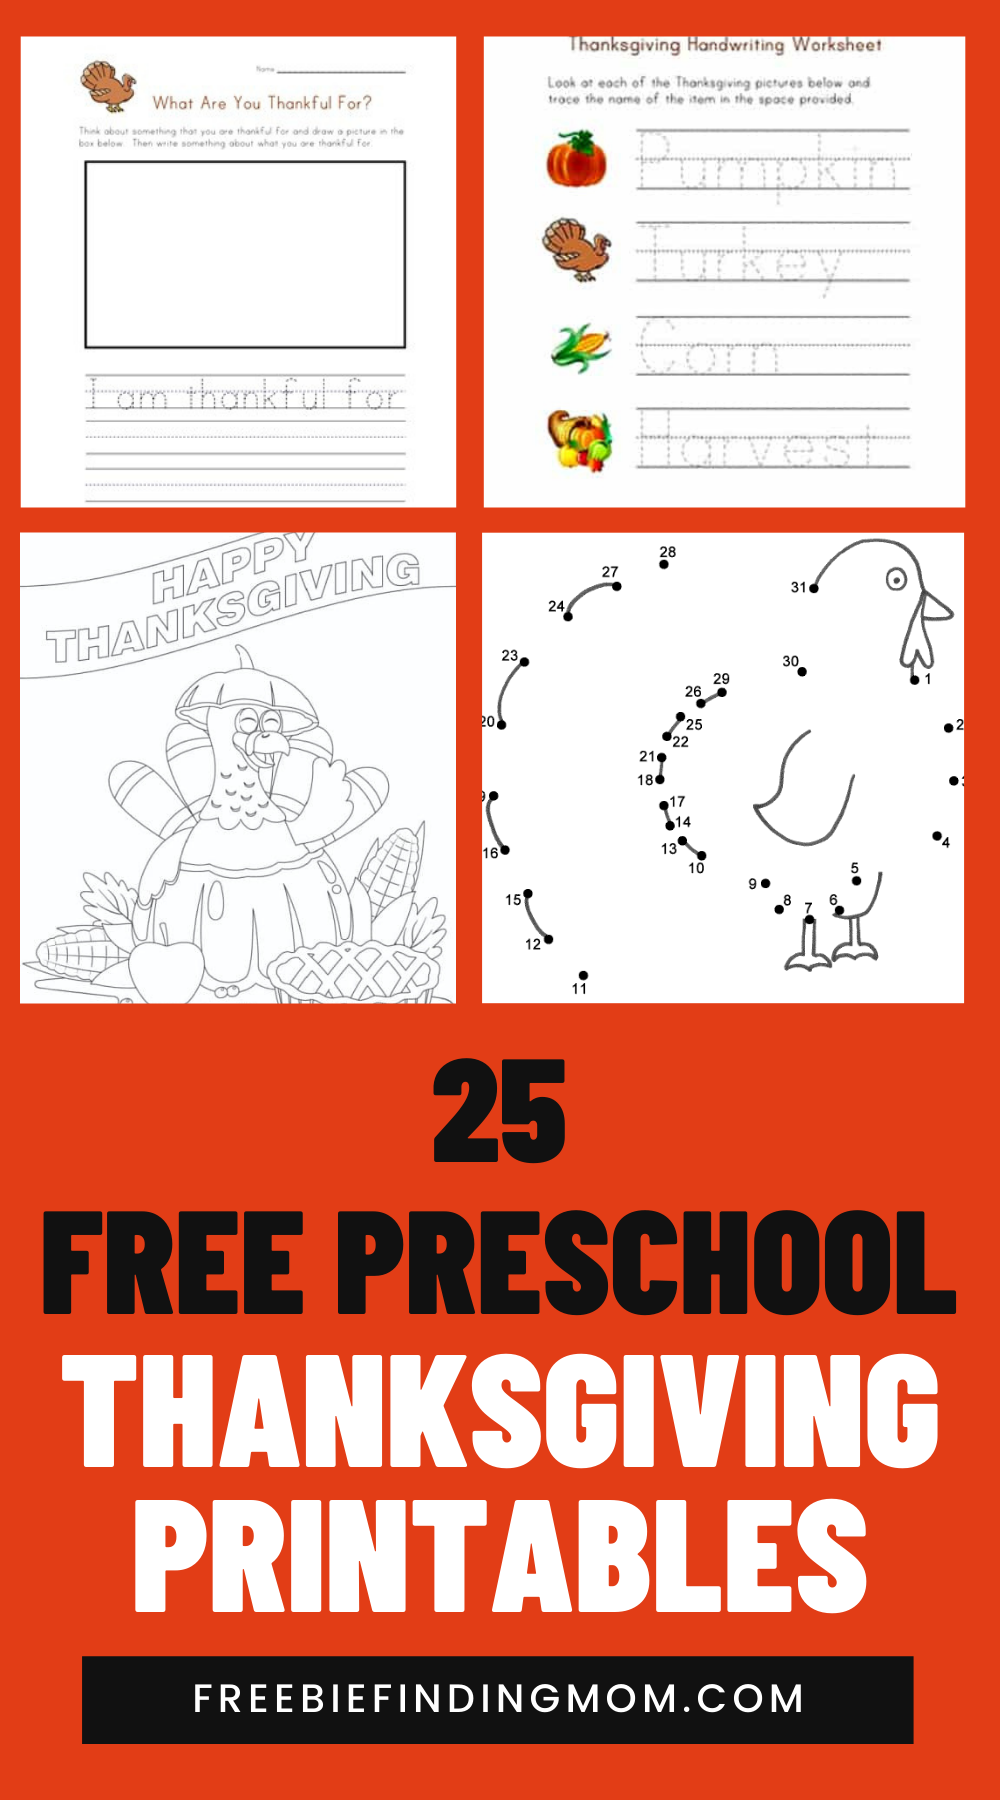 Predownload: 25 Free Preschool Thanksgiving Printables Freebie Finding Mom Thanksgiving Preschool Free Preschool Thanksgiving Activities Preschool [ 1800 x 1000 Pixel ]